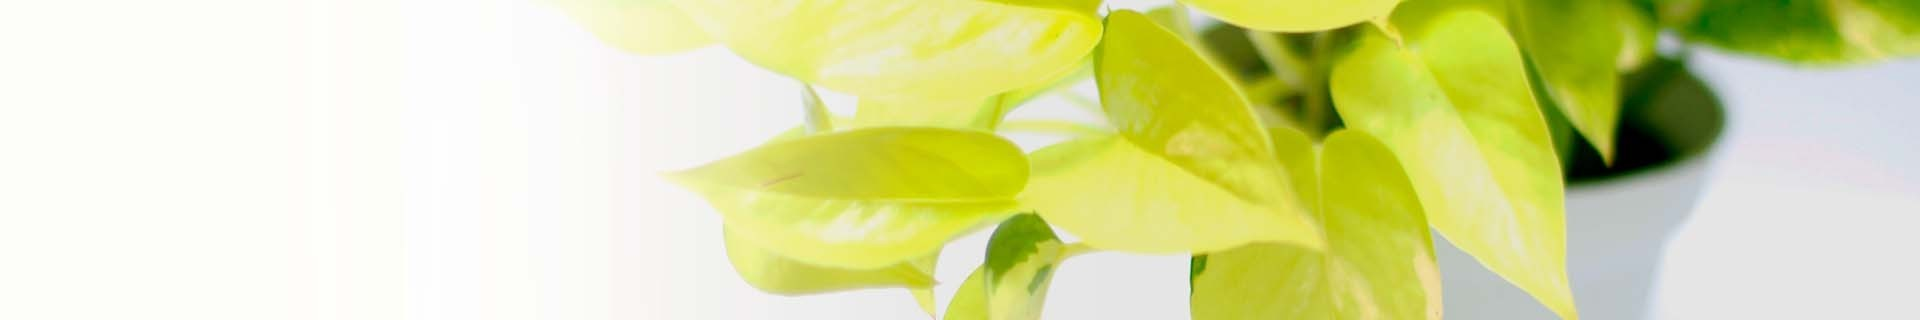 Plantes d'interior km 0: falguera, filodendro, cirtomi, banya de cérvol, davalia.